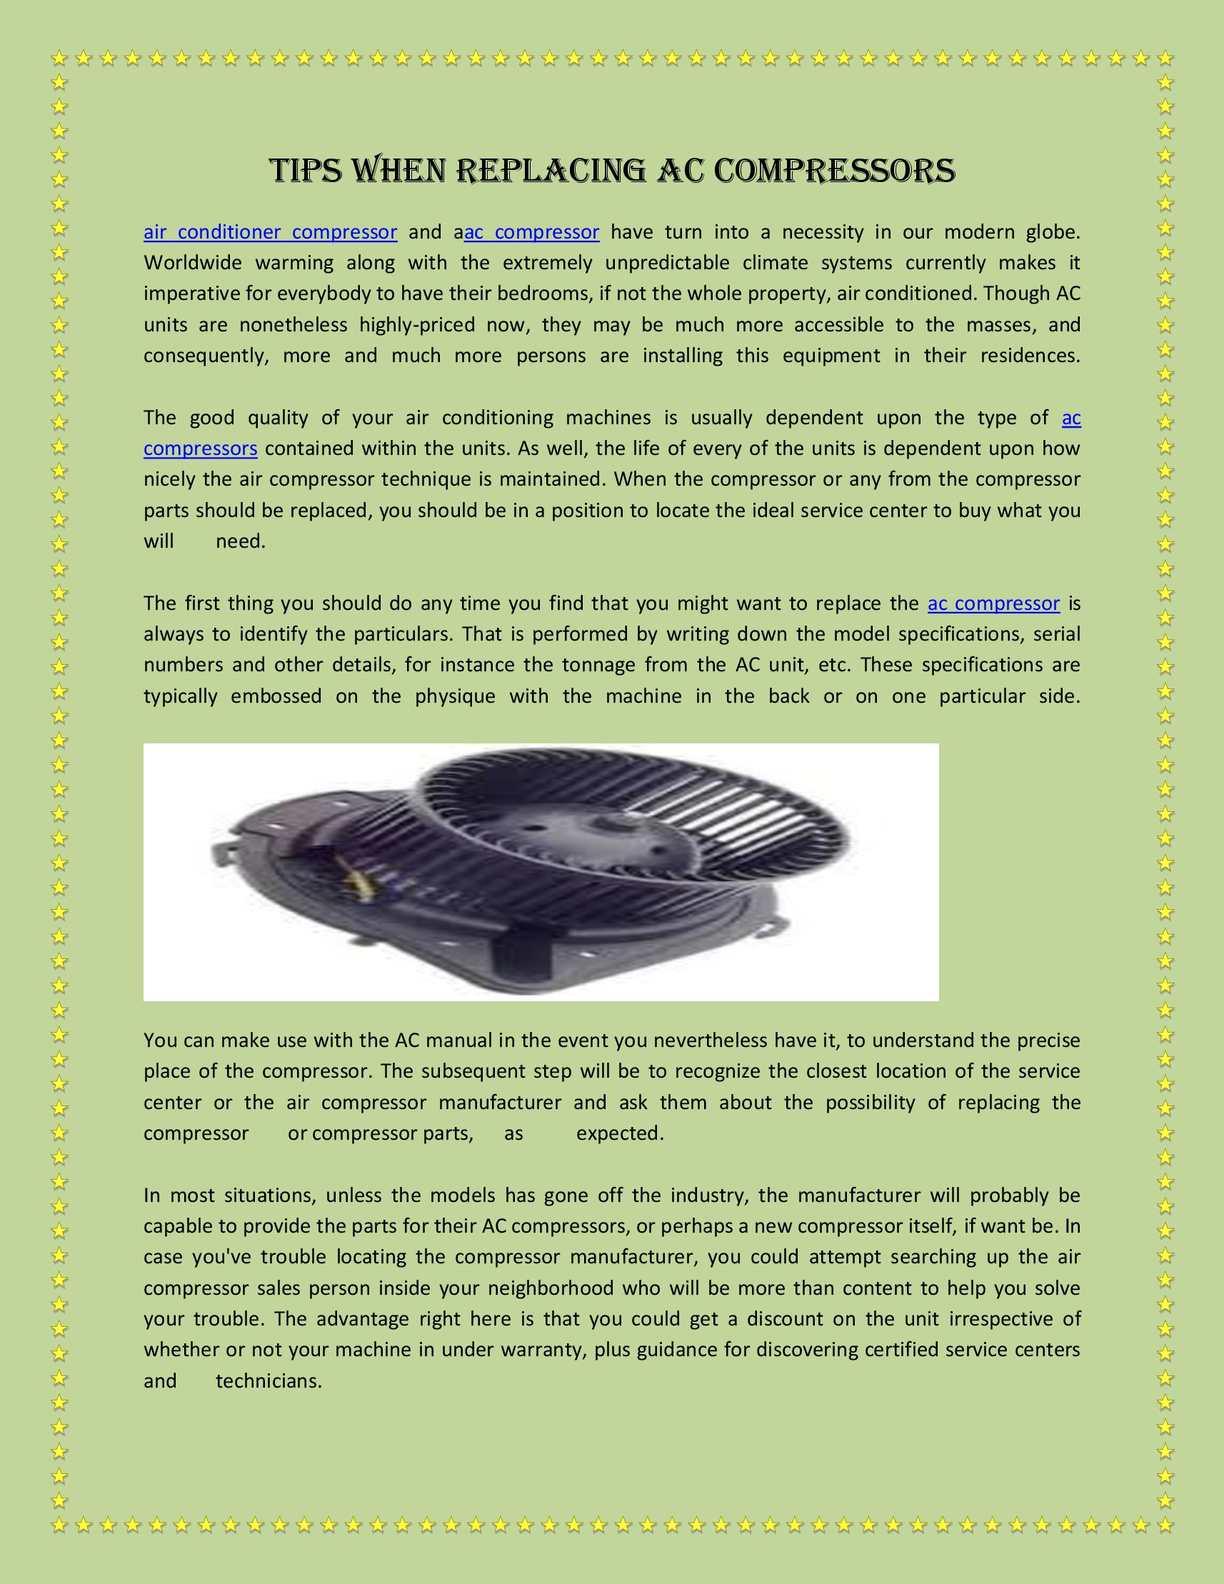 Calaméo - Tips When Replacing AC Compressors